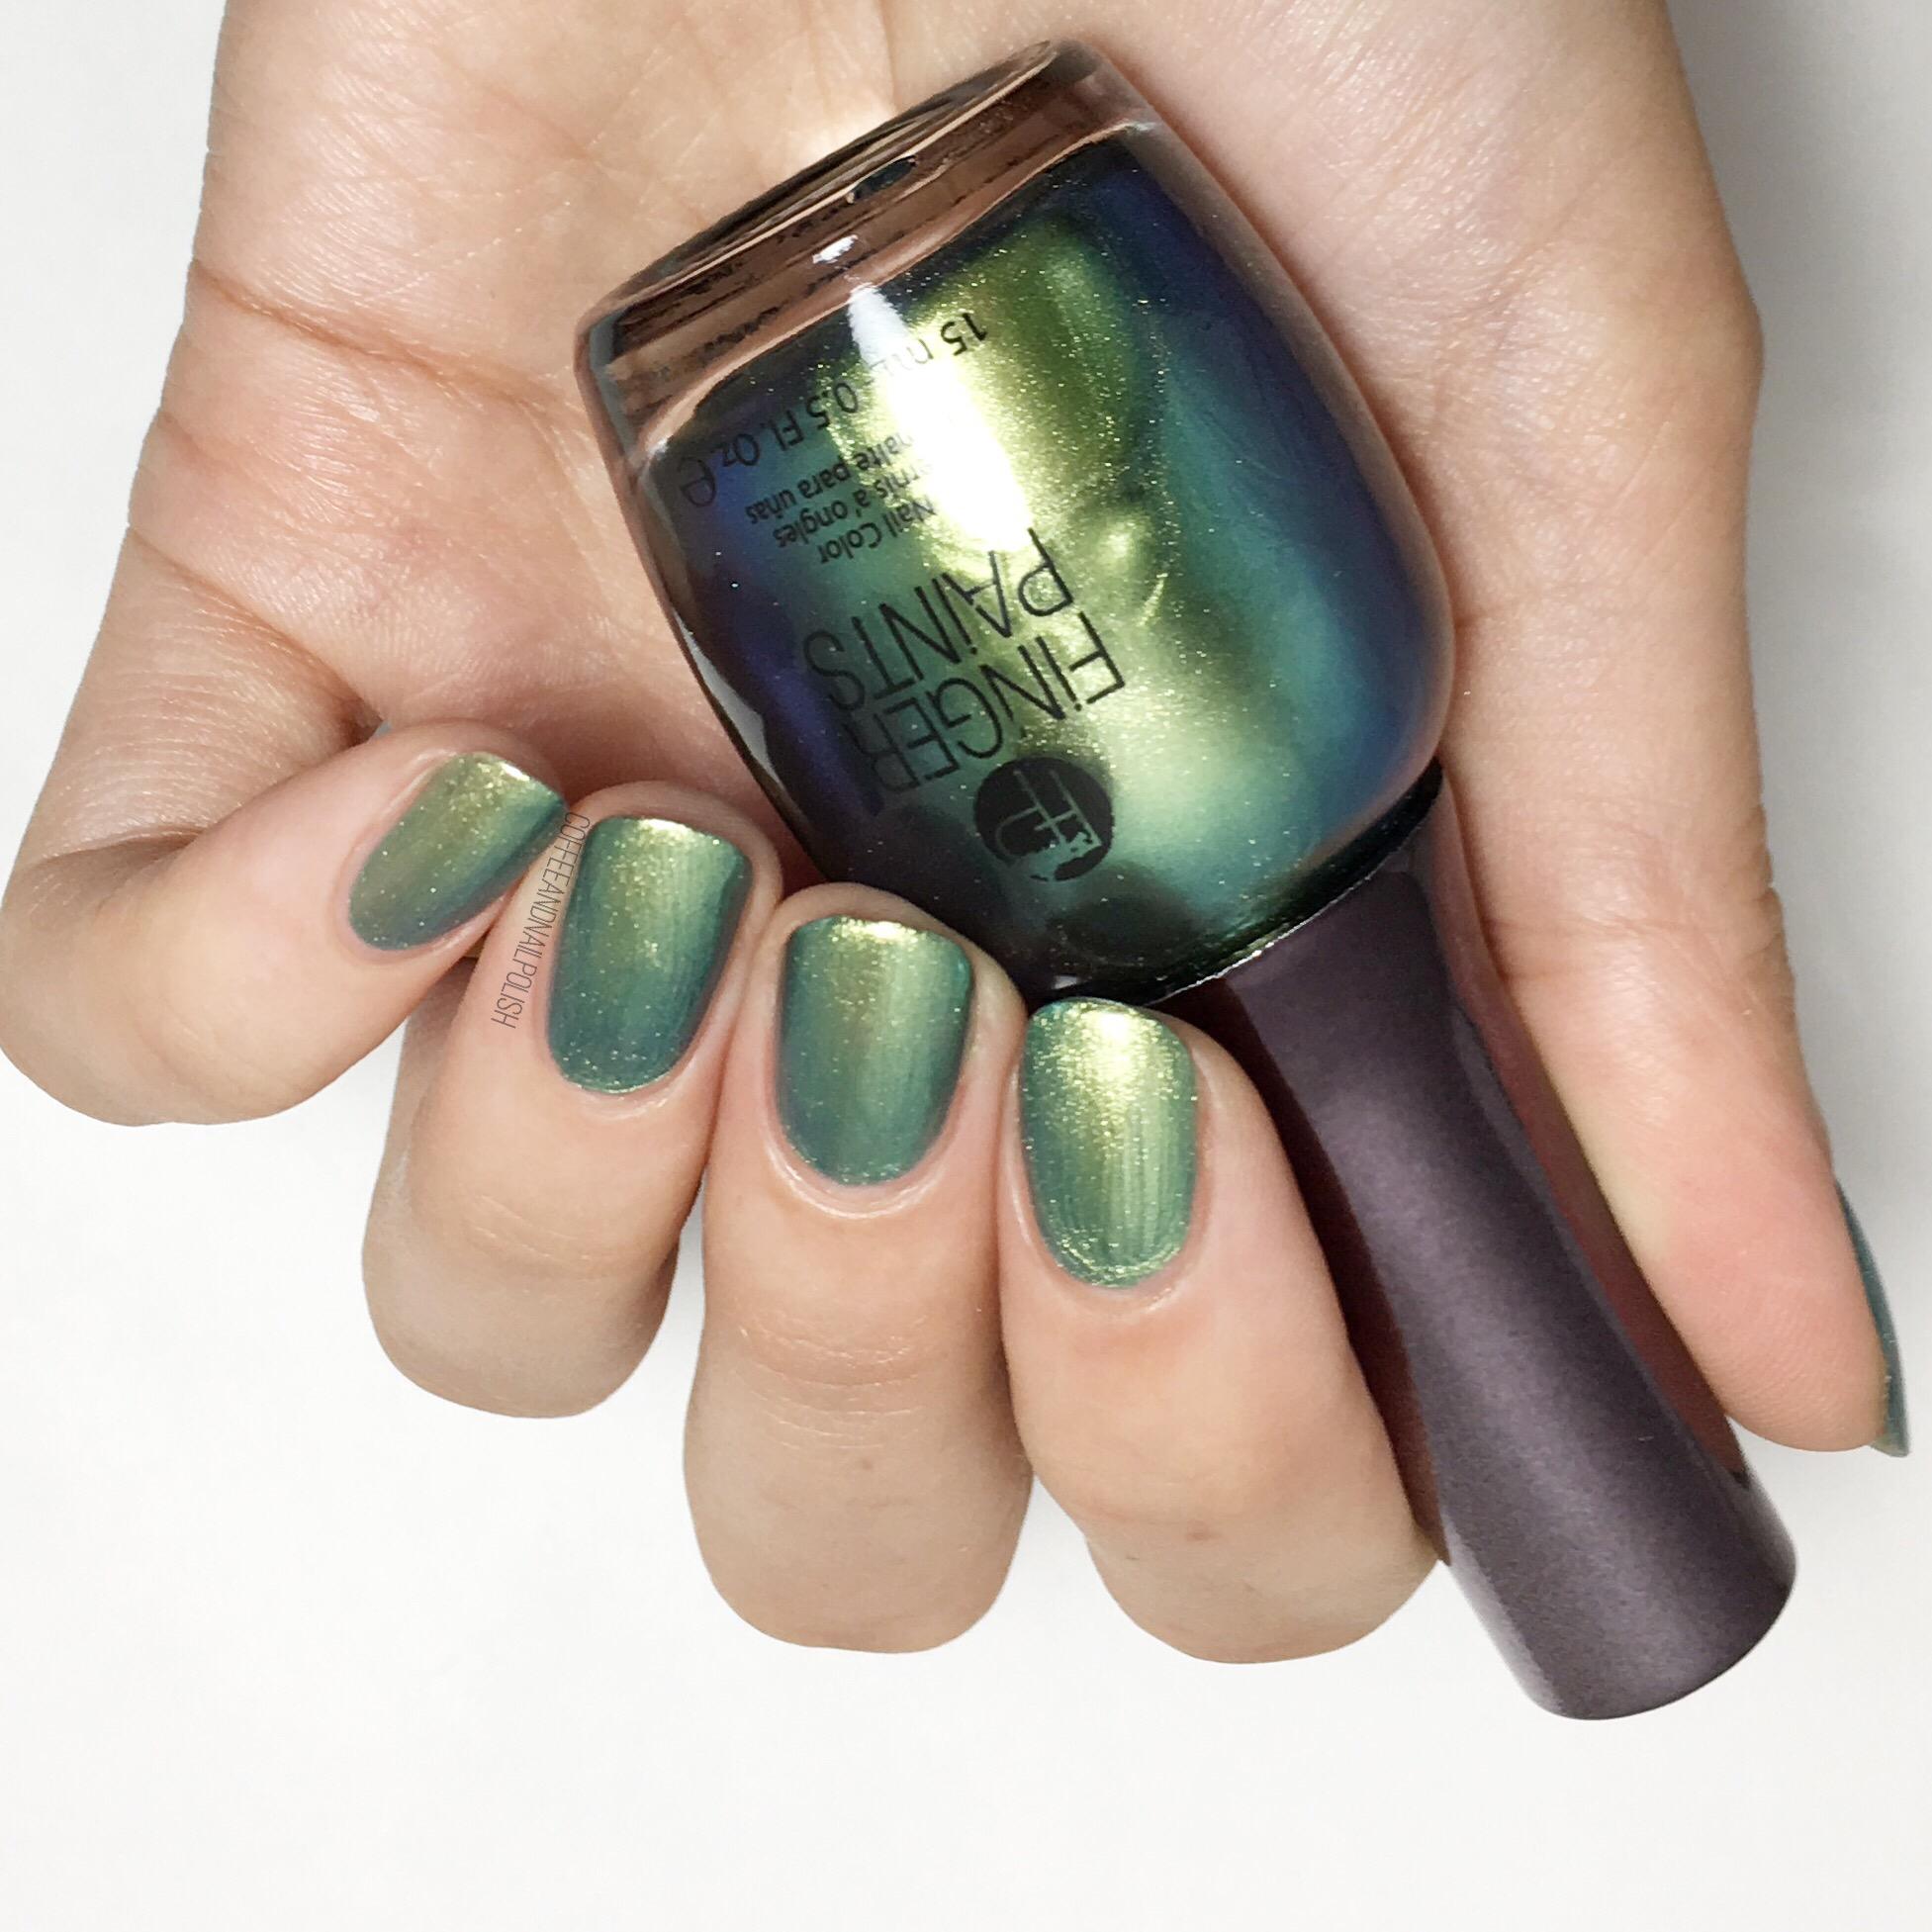 SWATCH SUNDAY: Finger Paints – Coffee & Nail Polish